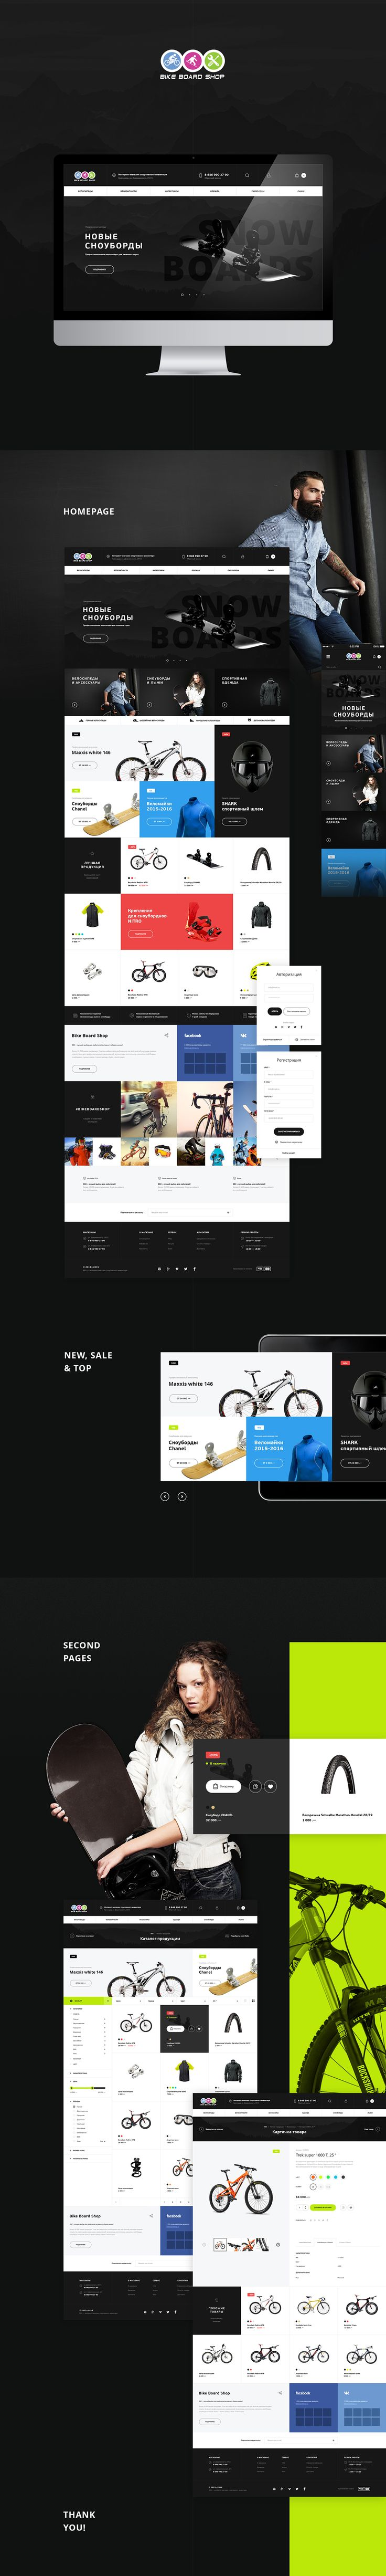 Bike Board Shop - ecommerce shop